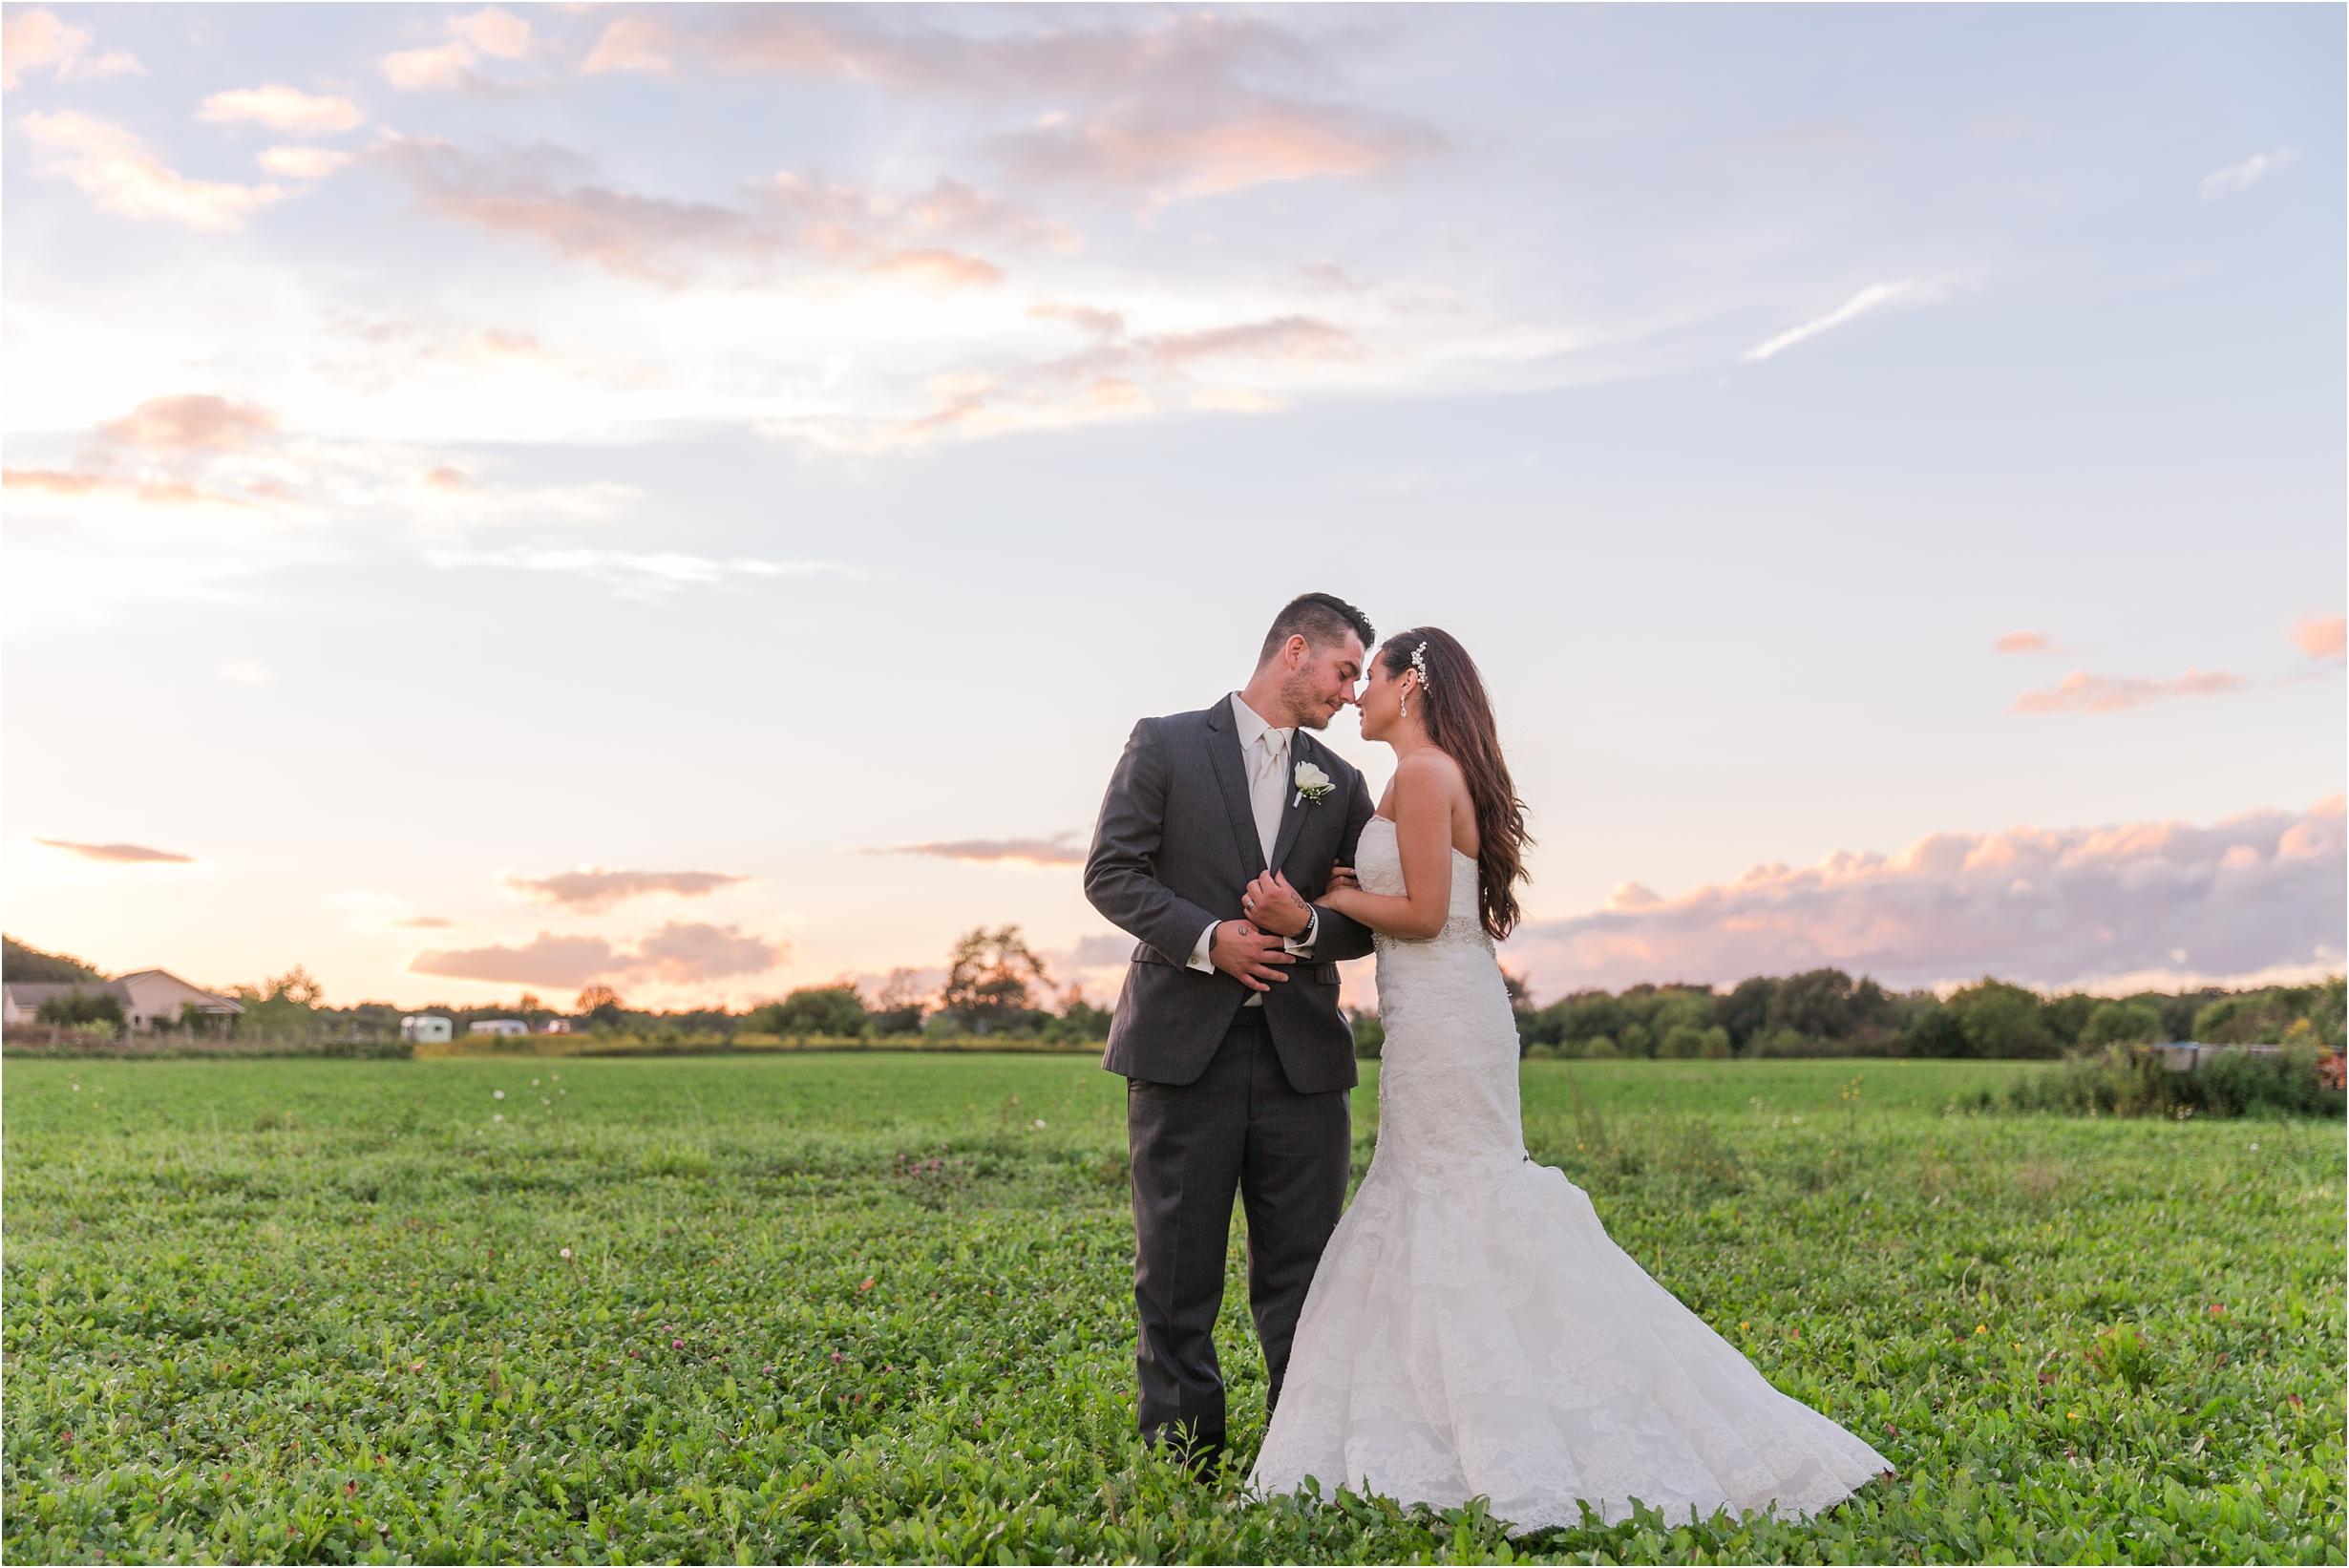 romantic-timeless-candid-wedding-photos-at-the-valley-frutig-farms-in-ann-arbor-mi-by-courtney-carolyn-photography_0009.jpg